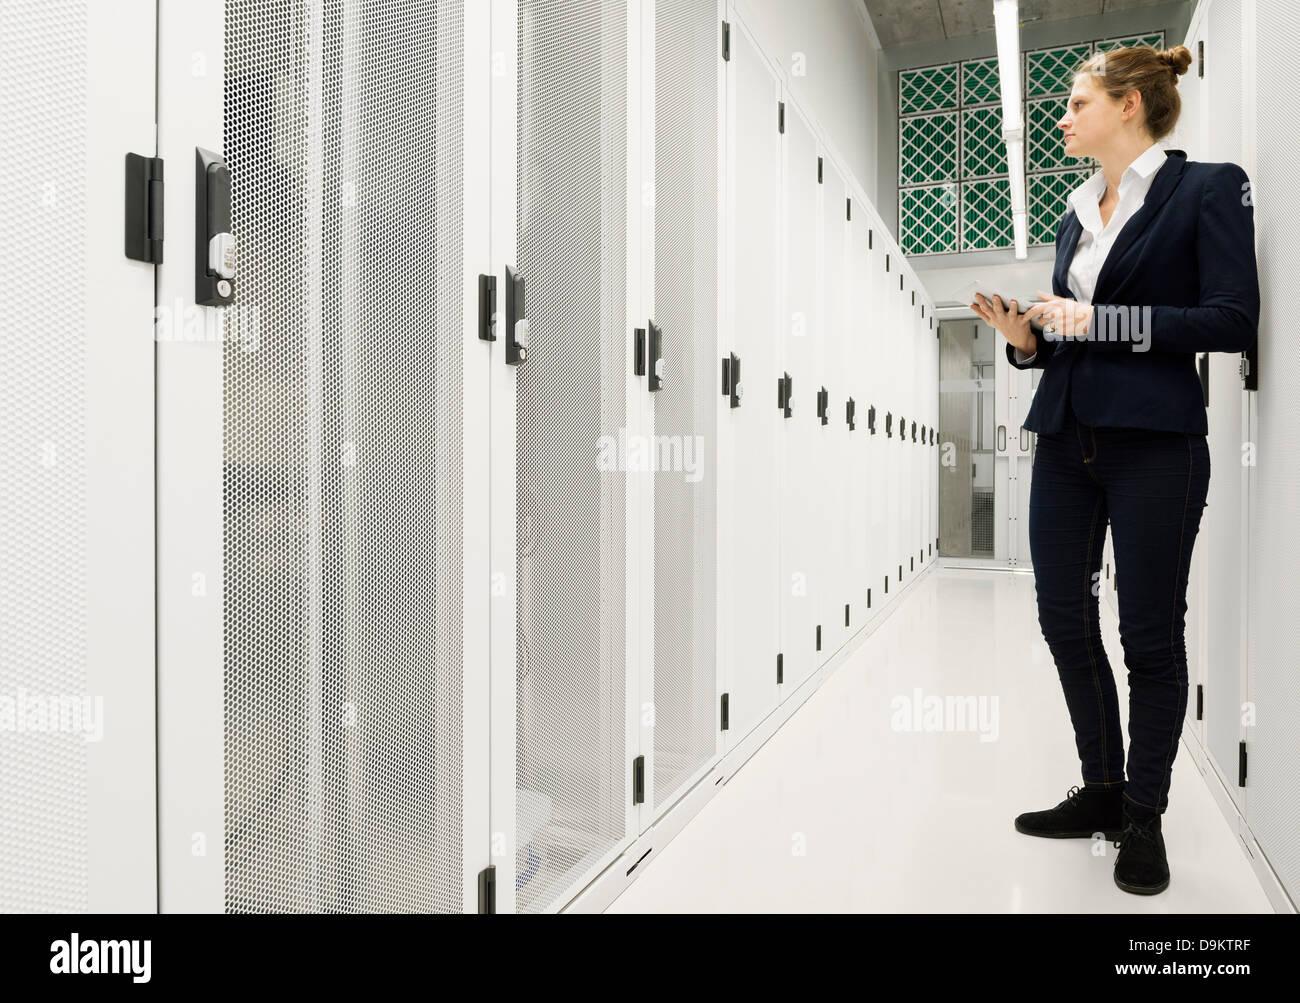 Employee working in data storage warehouse - Stock Image